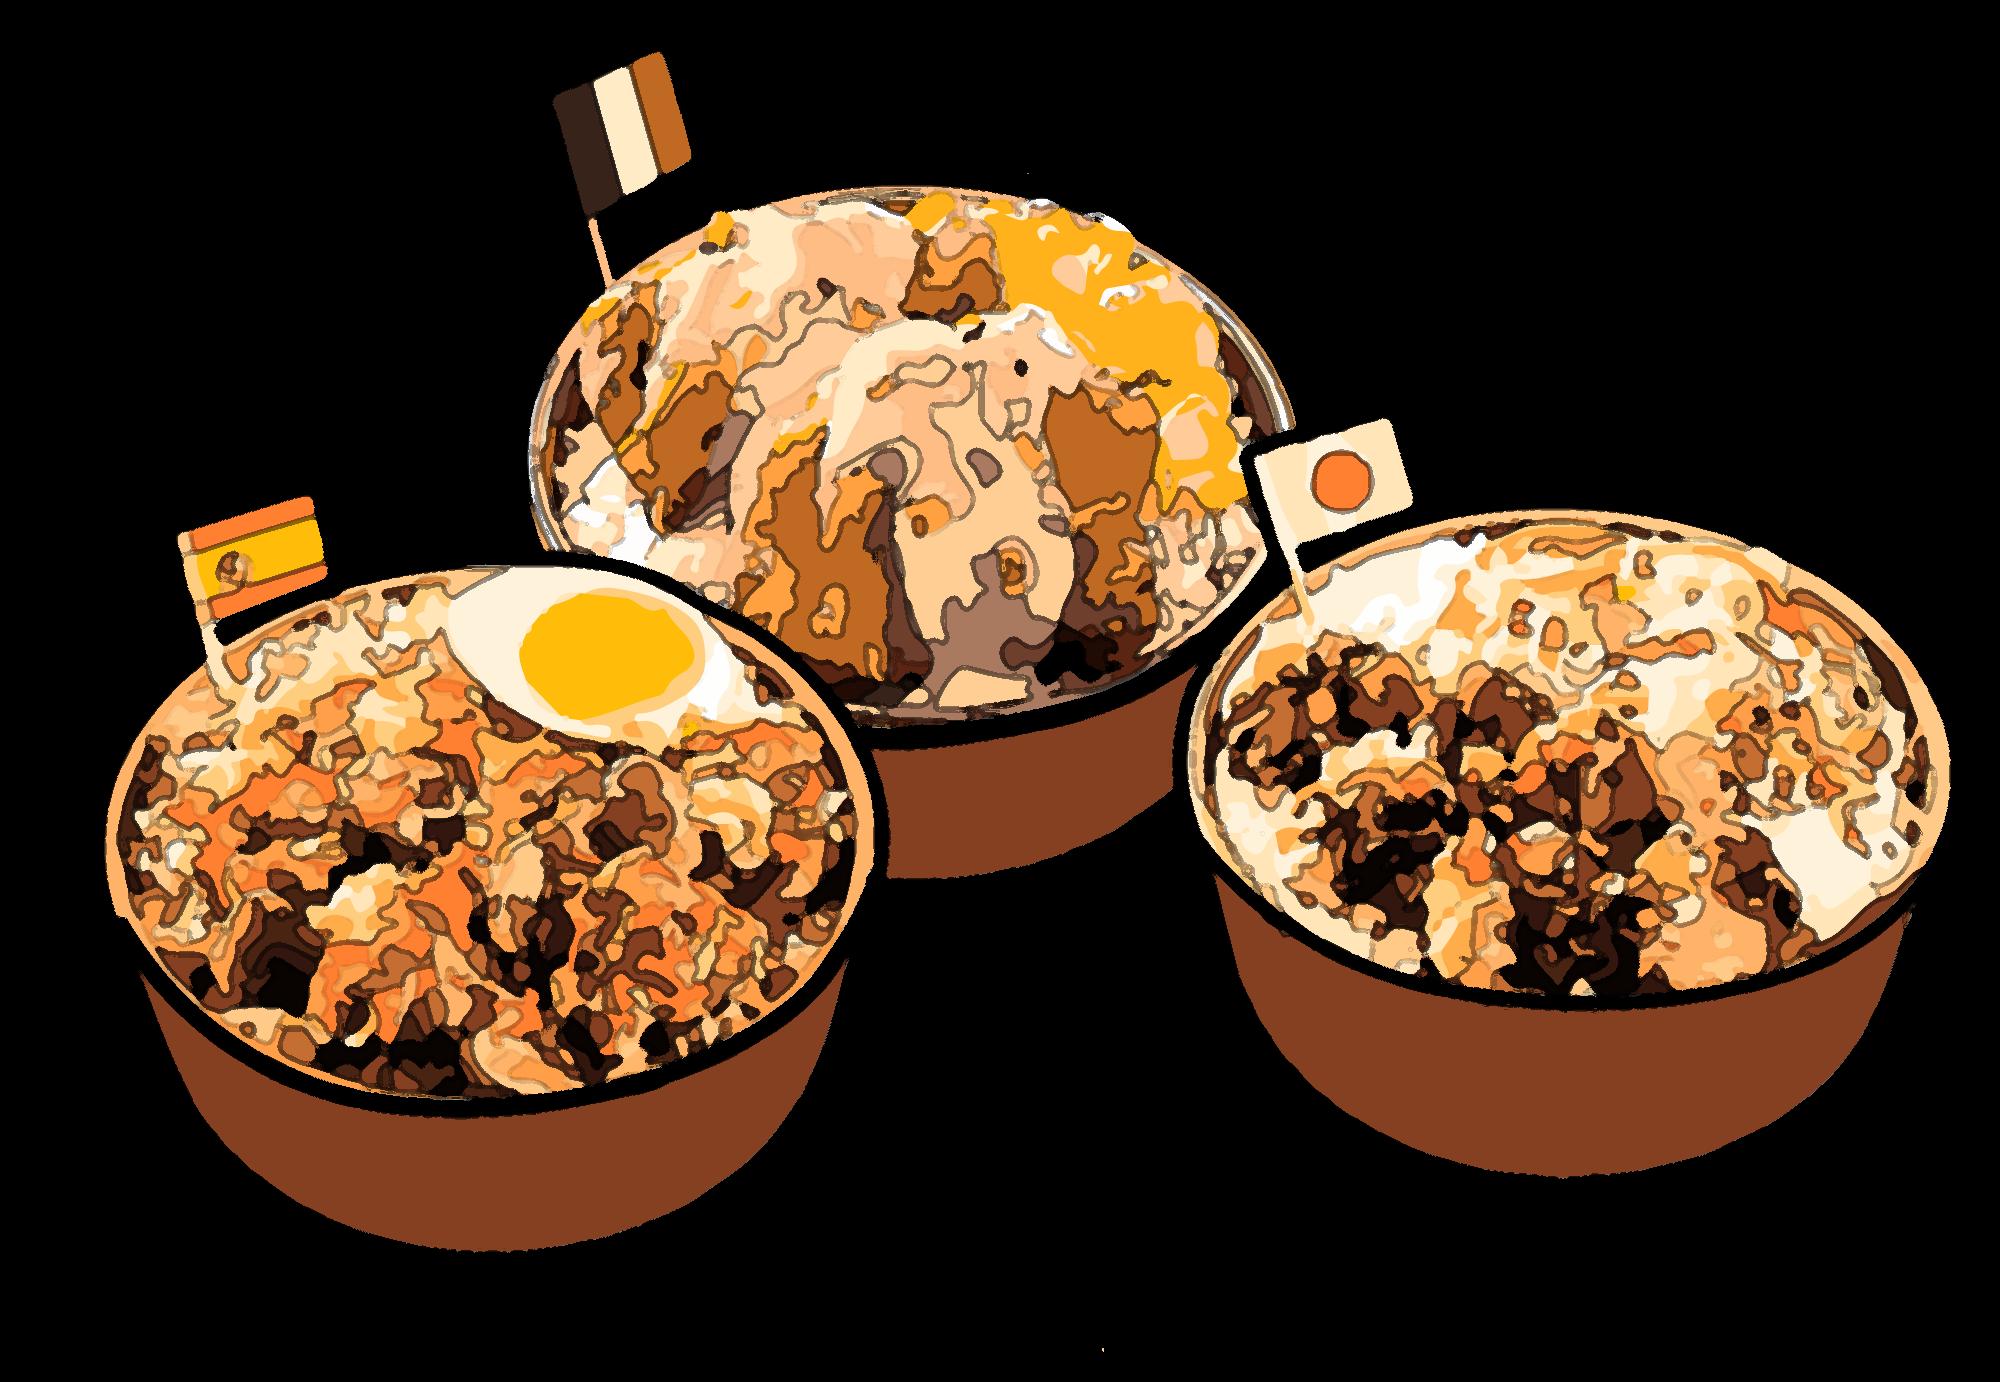 Discontinued Fast Food Items: KFC Foodtrip Rice Bowl Meals